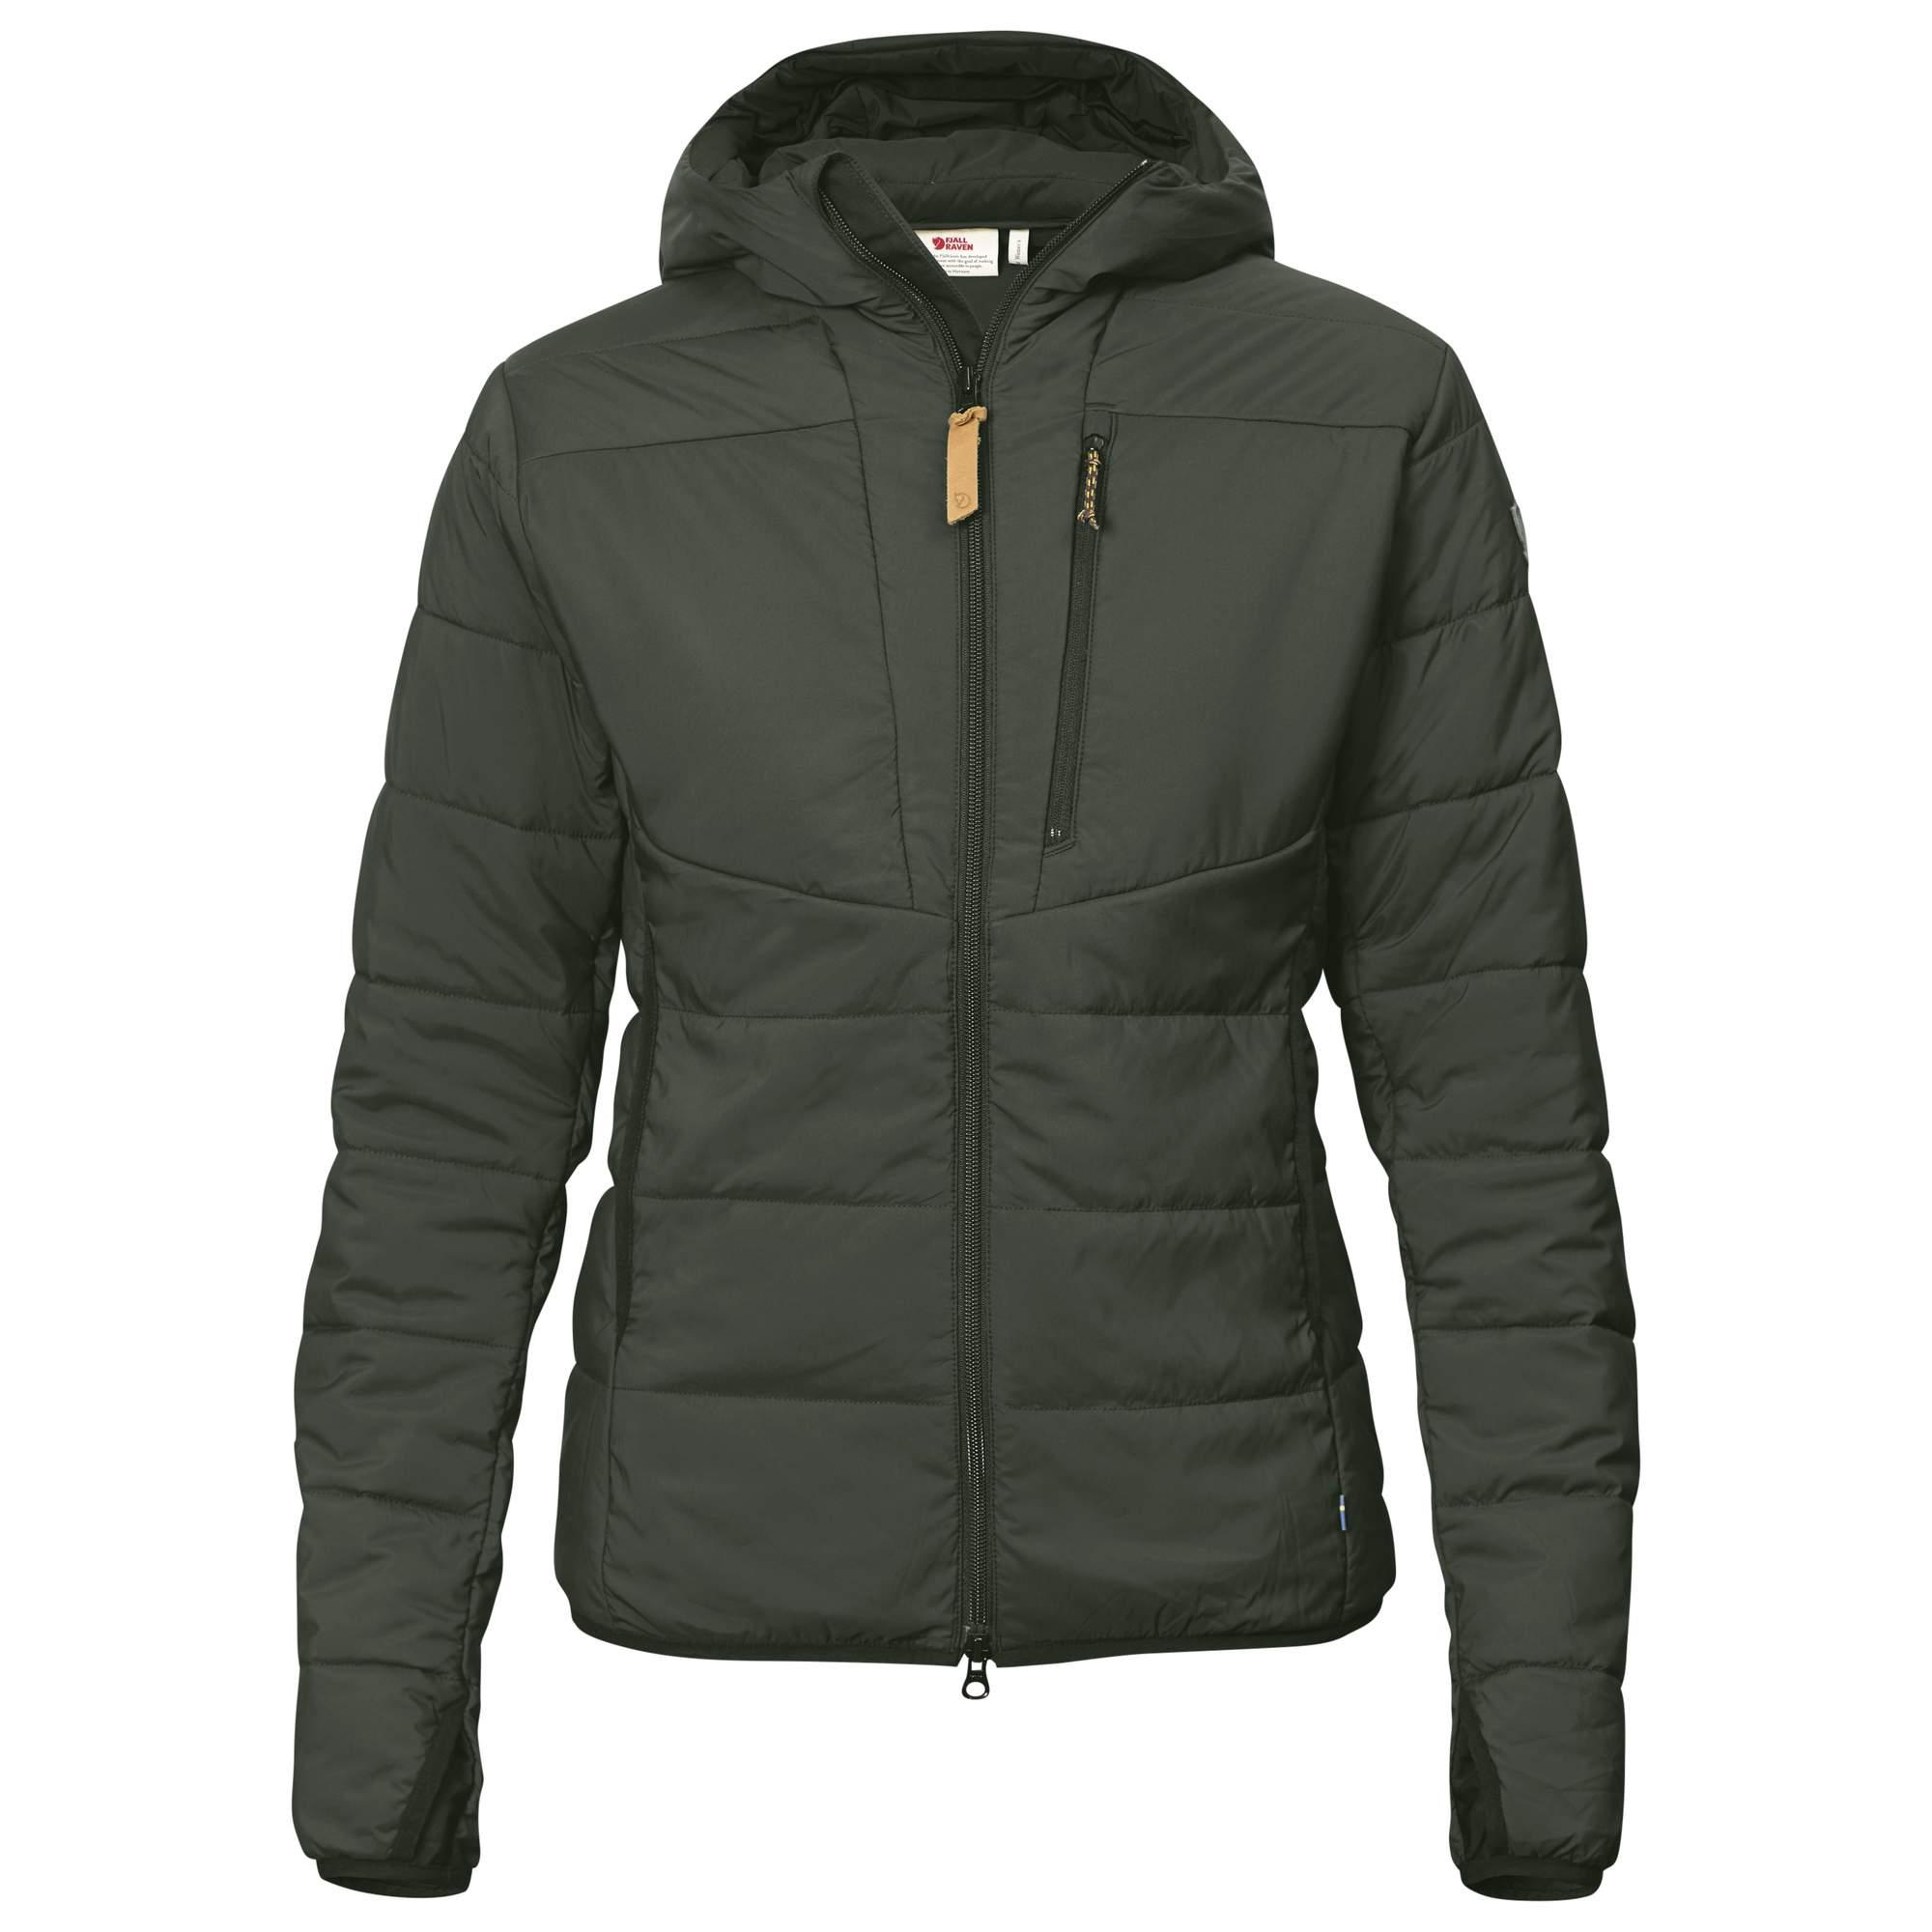 Felpa Donna Fj/ällr/även Keb Fleece Vest W